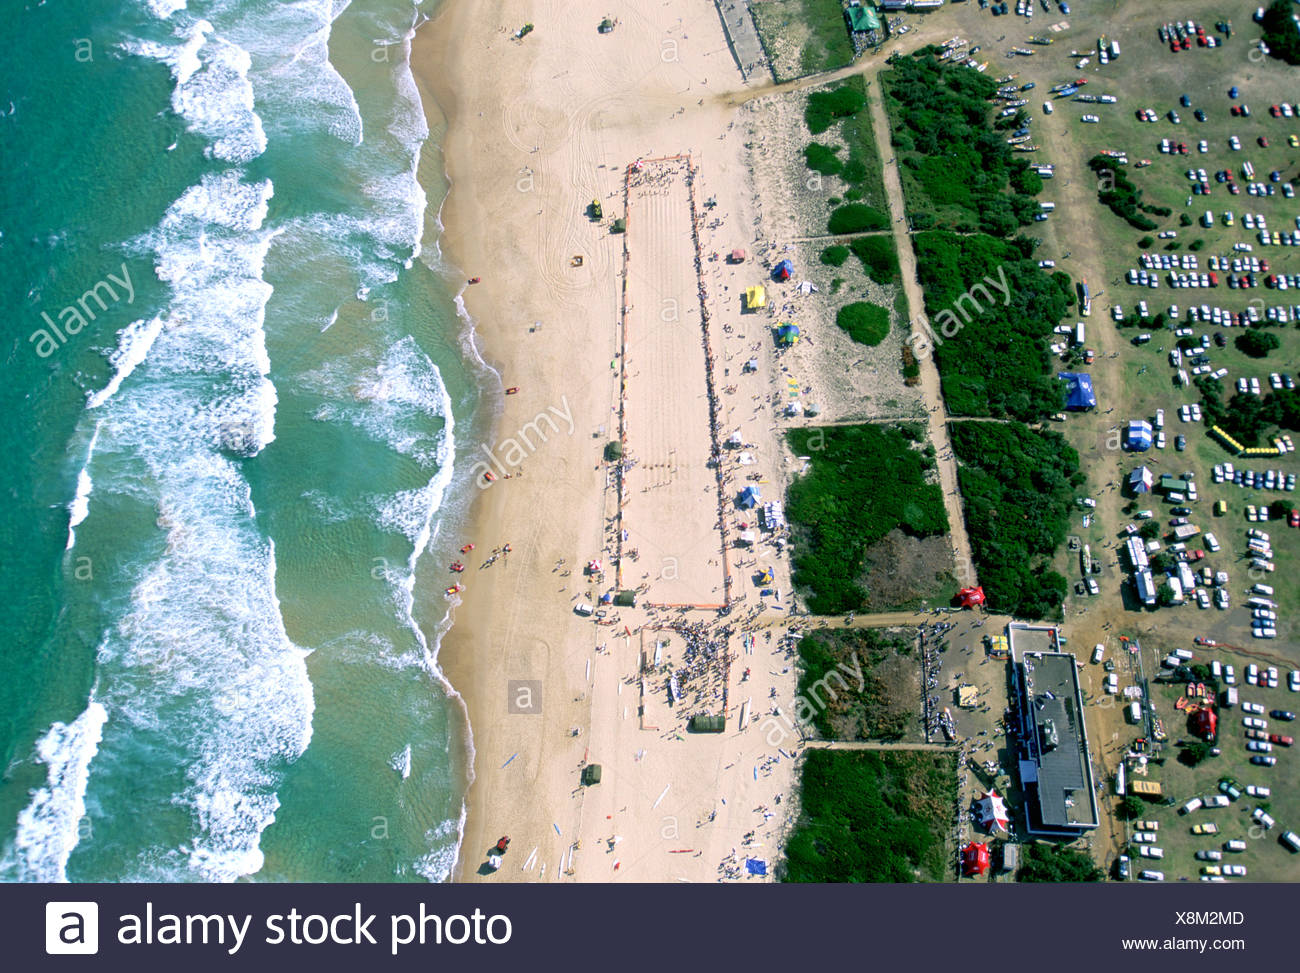 AERIAL SHOT OF SYDNEY BAY AUSTRALIA - Stock Image